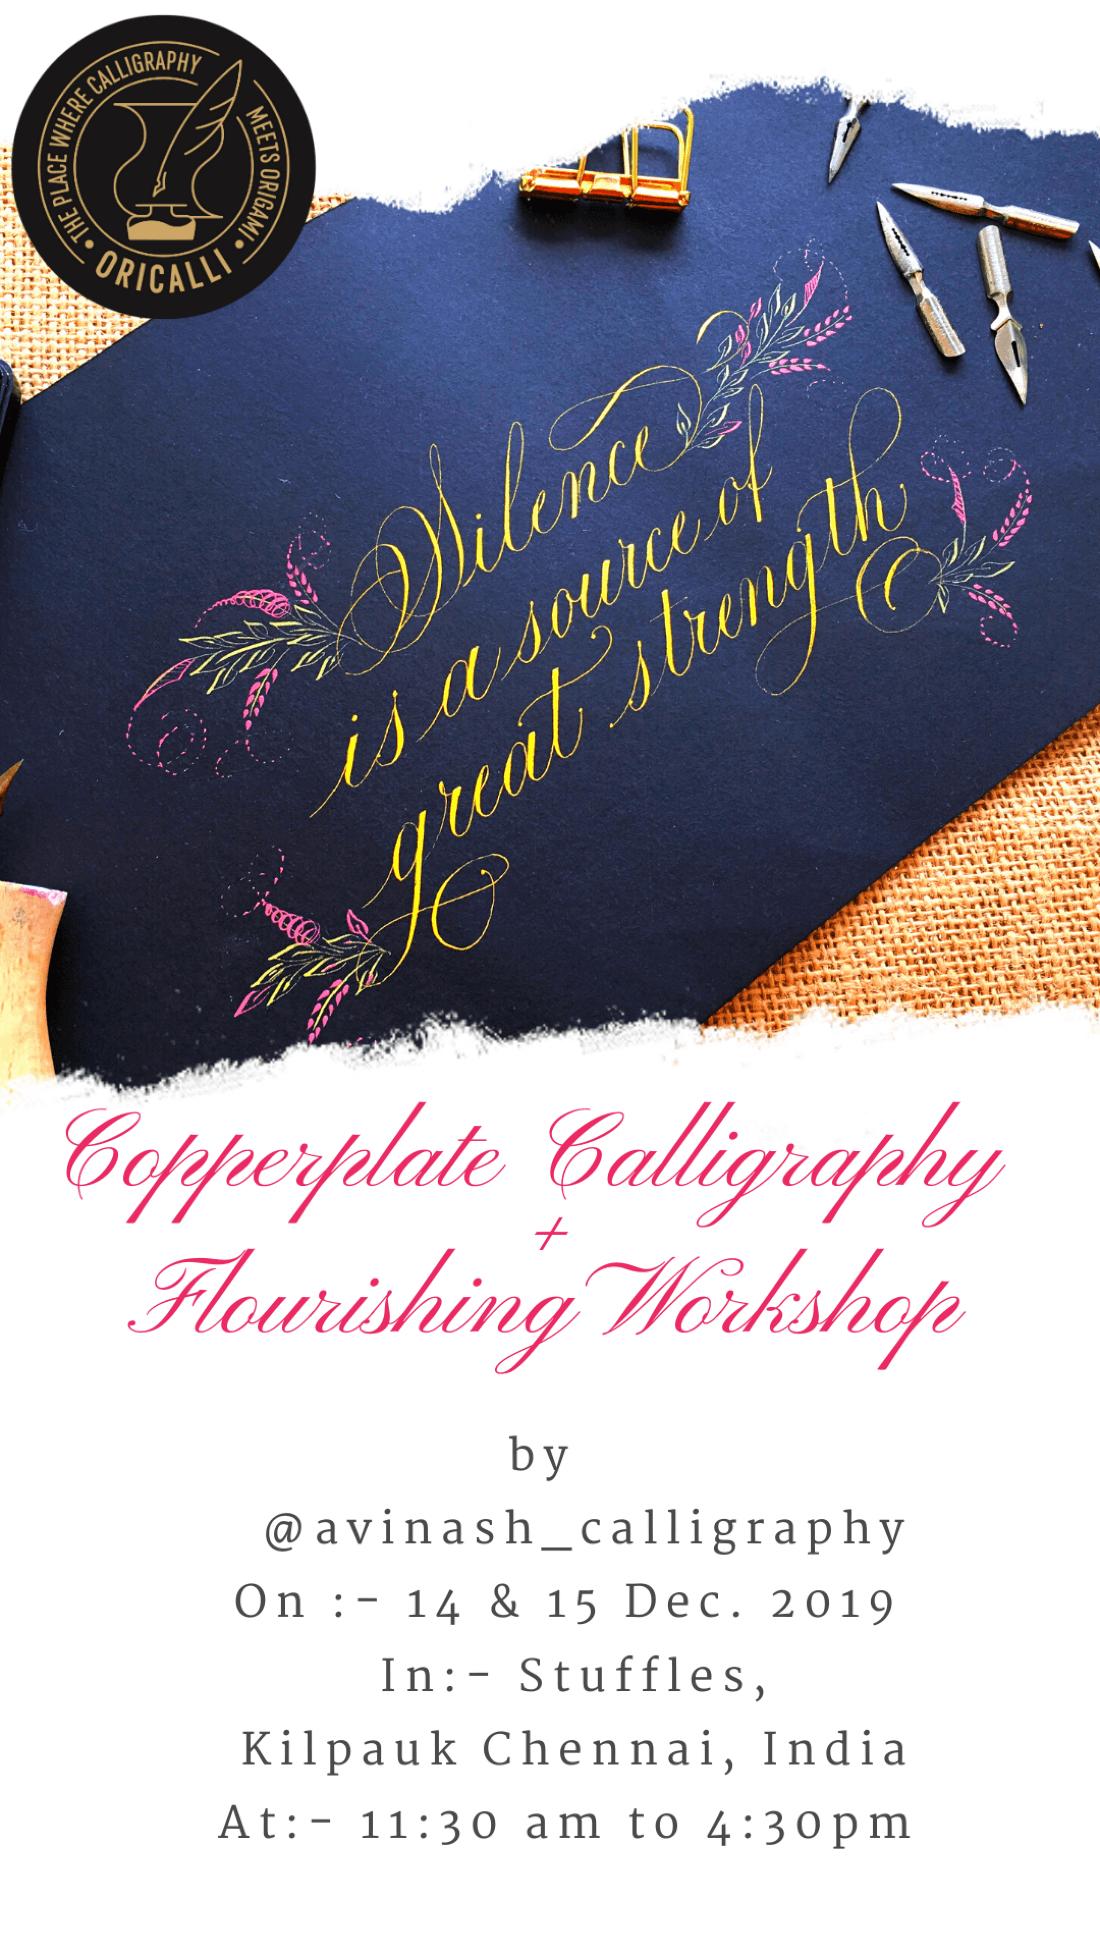 Copperplate plus flourishing calligraphy workshop